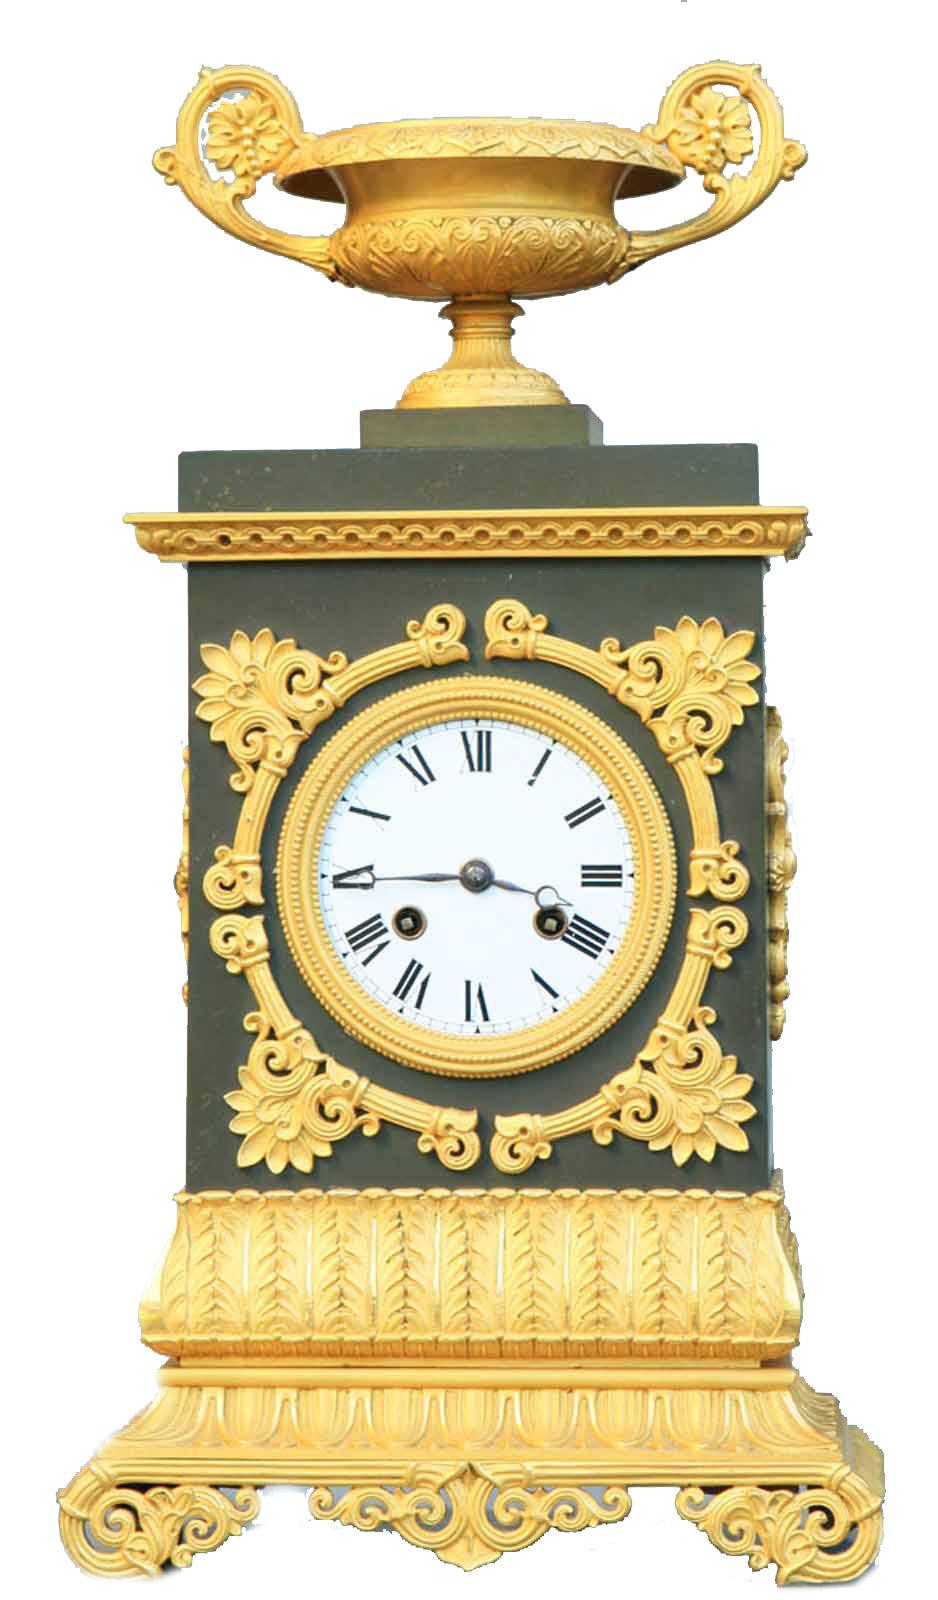 antique_clock_english_regency_8410